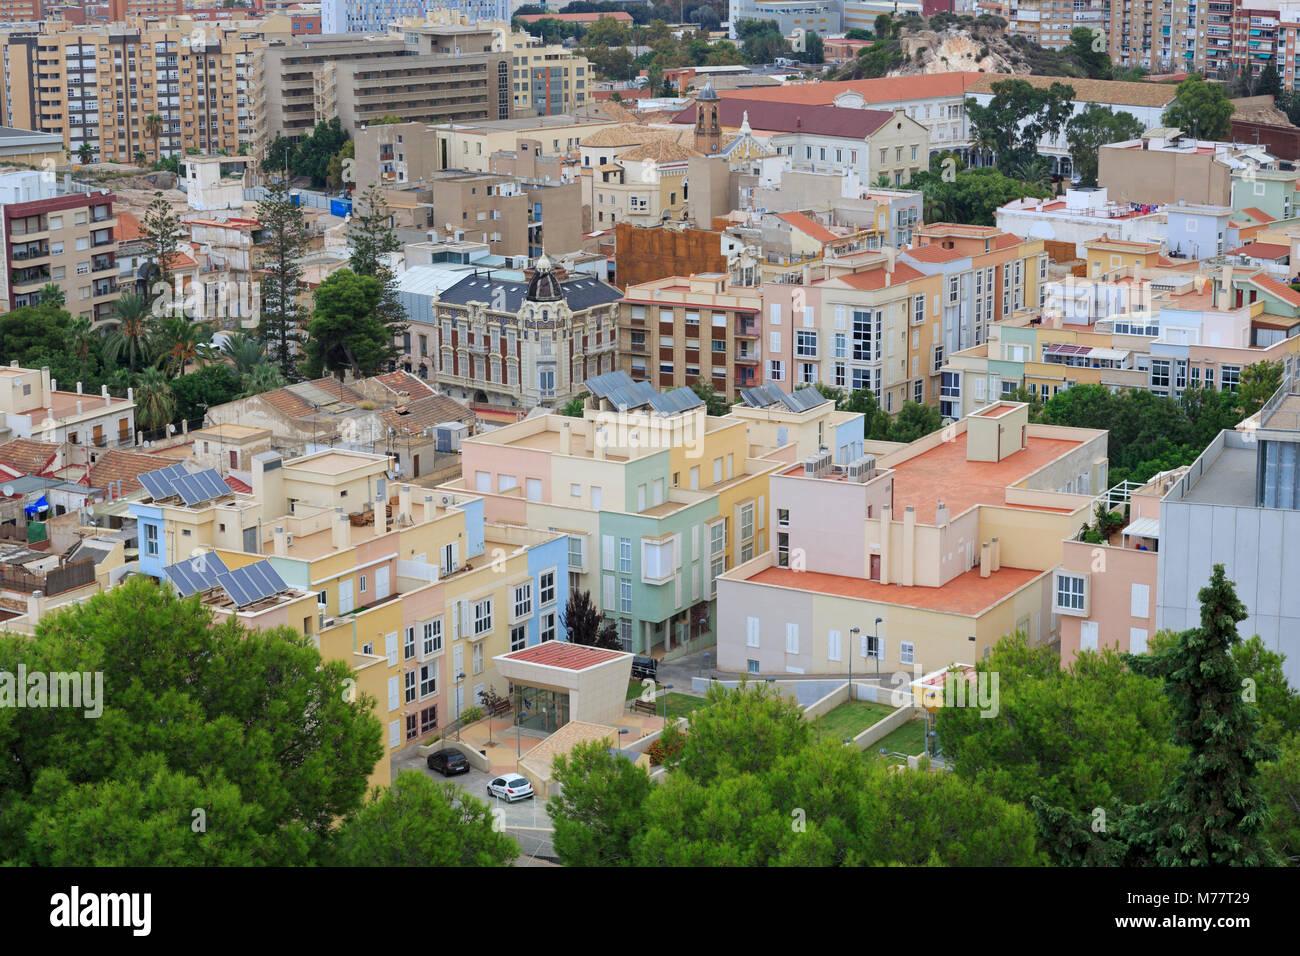 Cartagena, Murcia, Spanien, Europa Stockbild